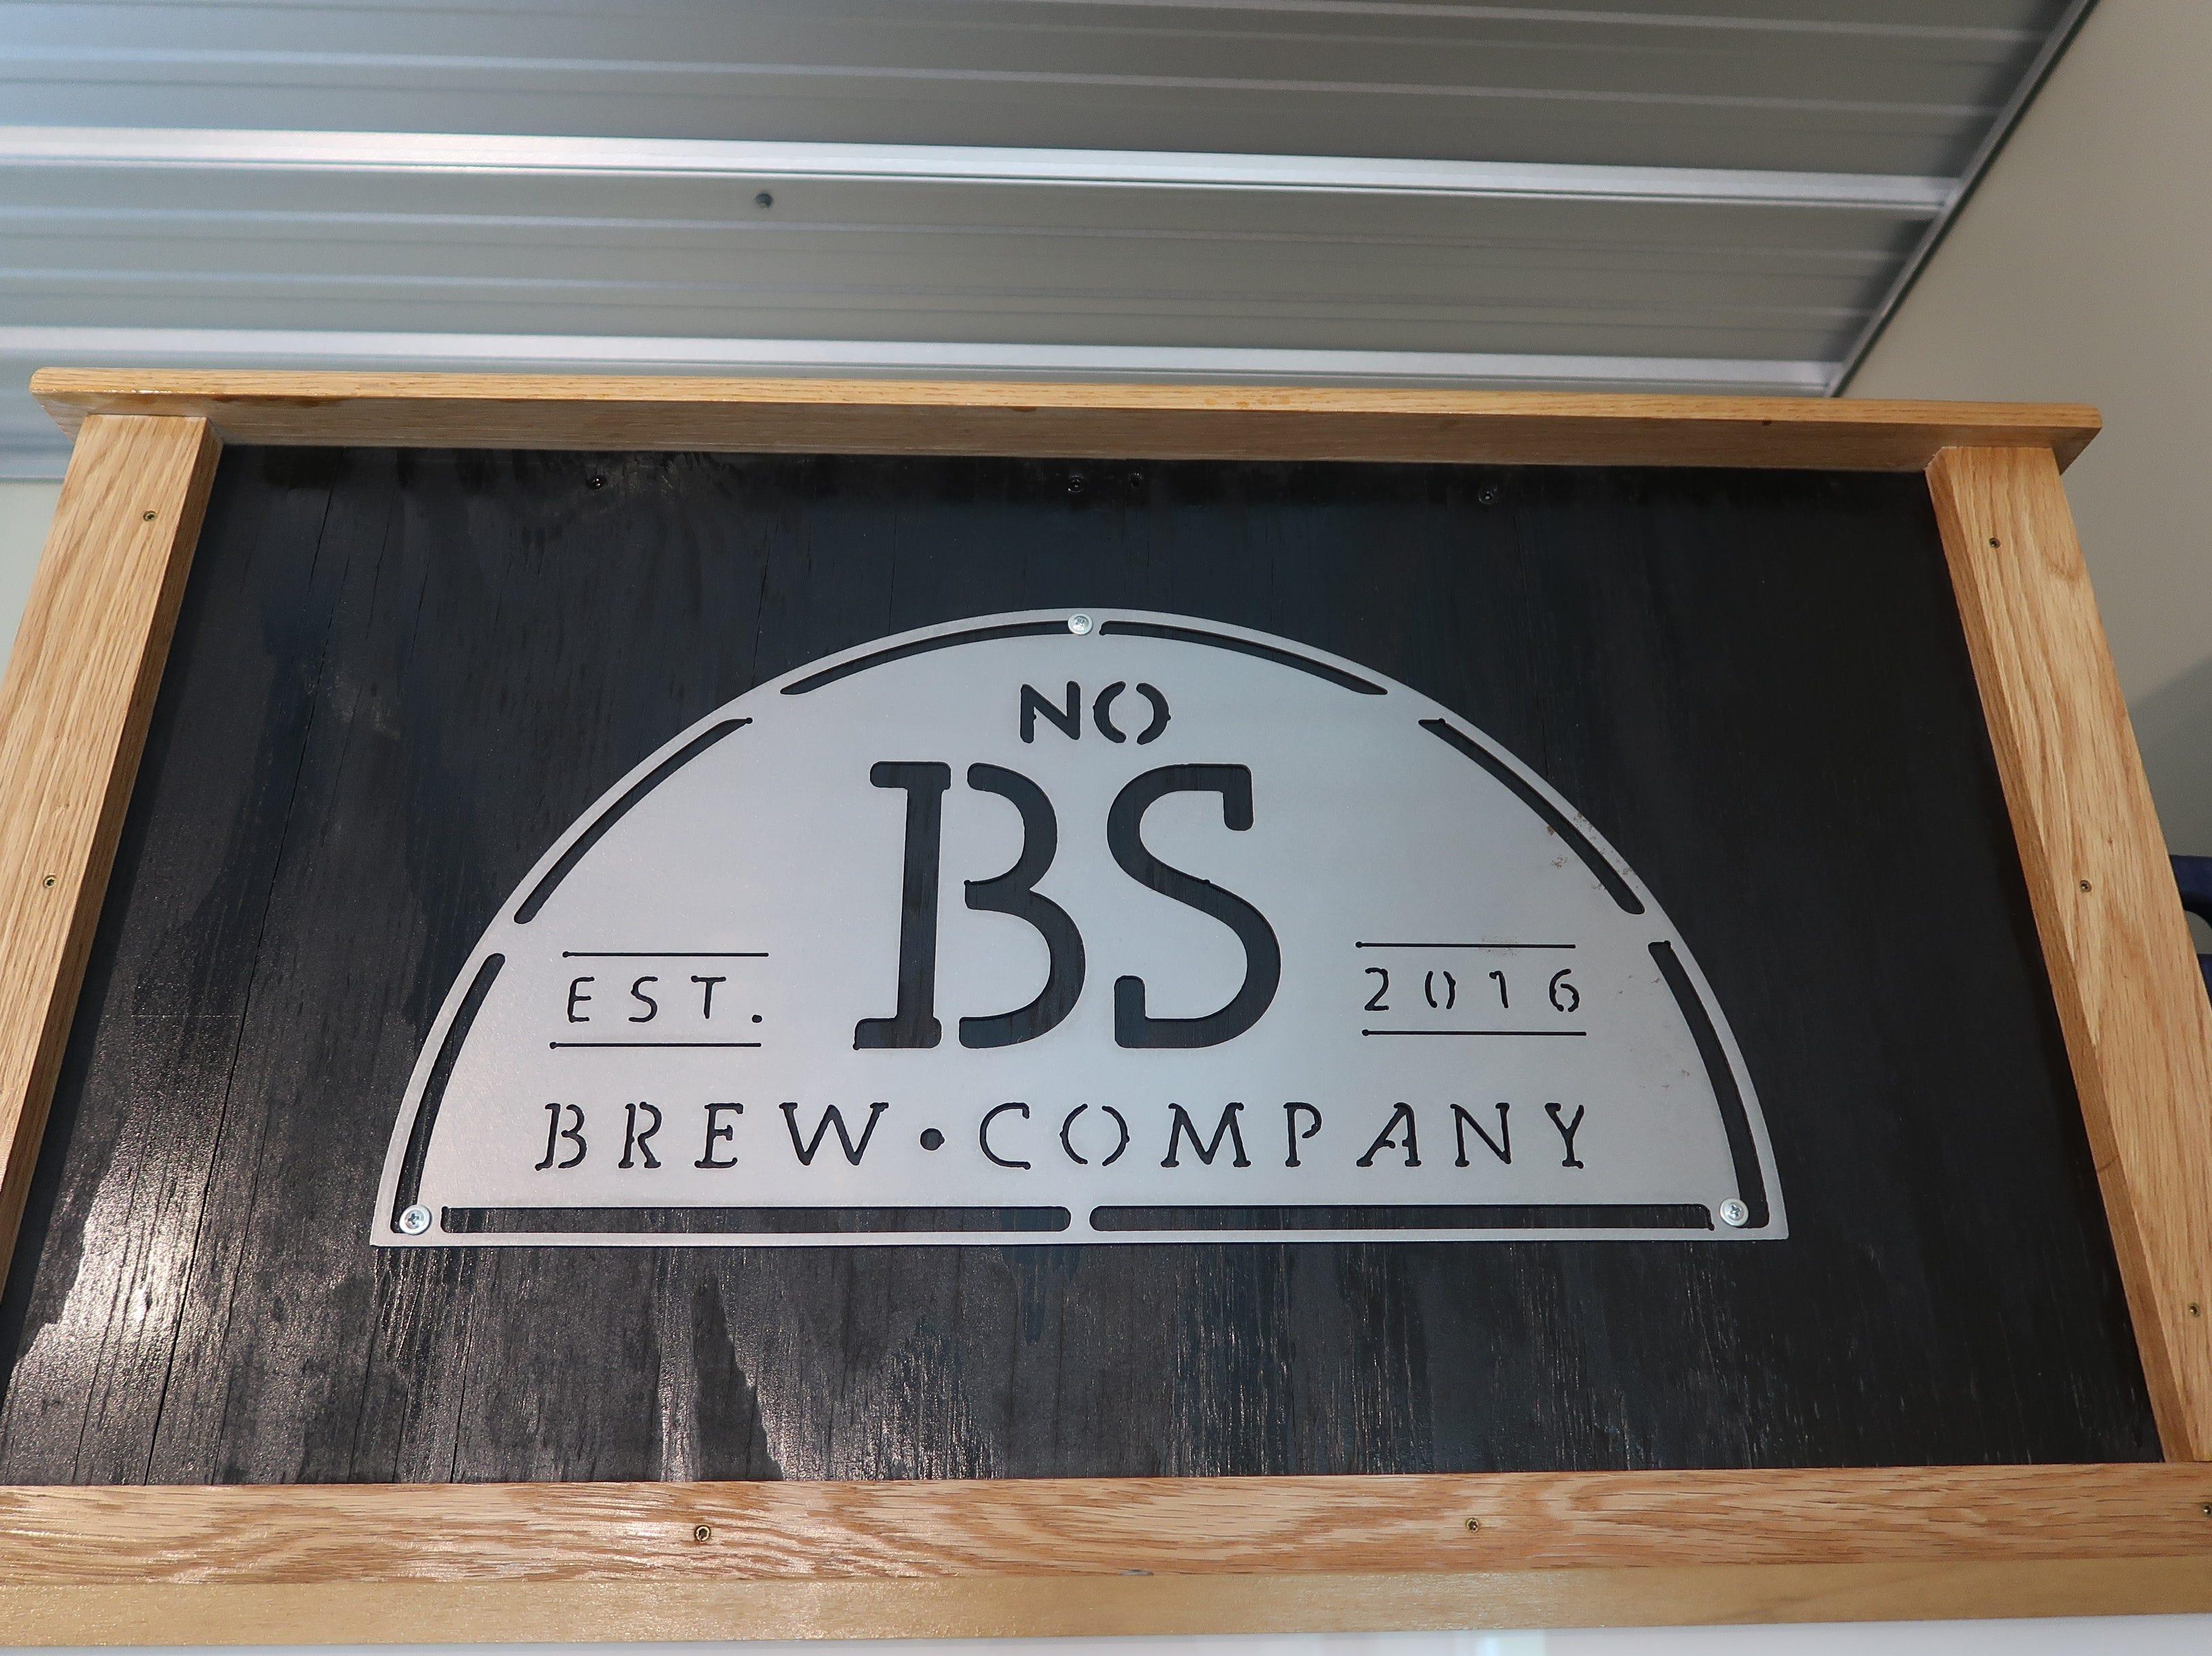 No BS Brew Company in Livonia,